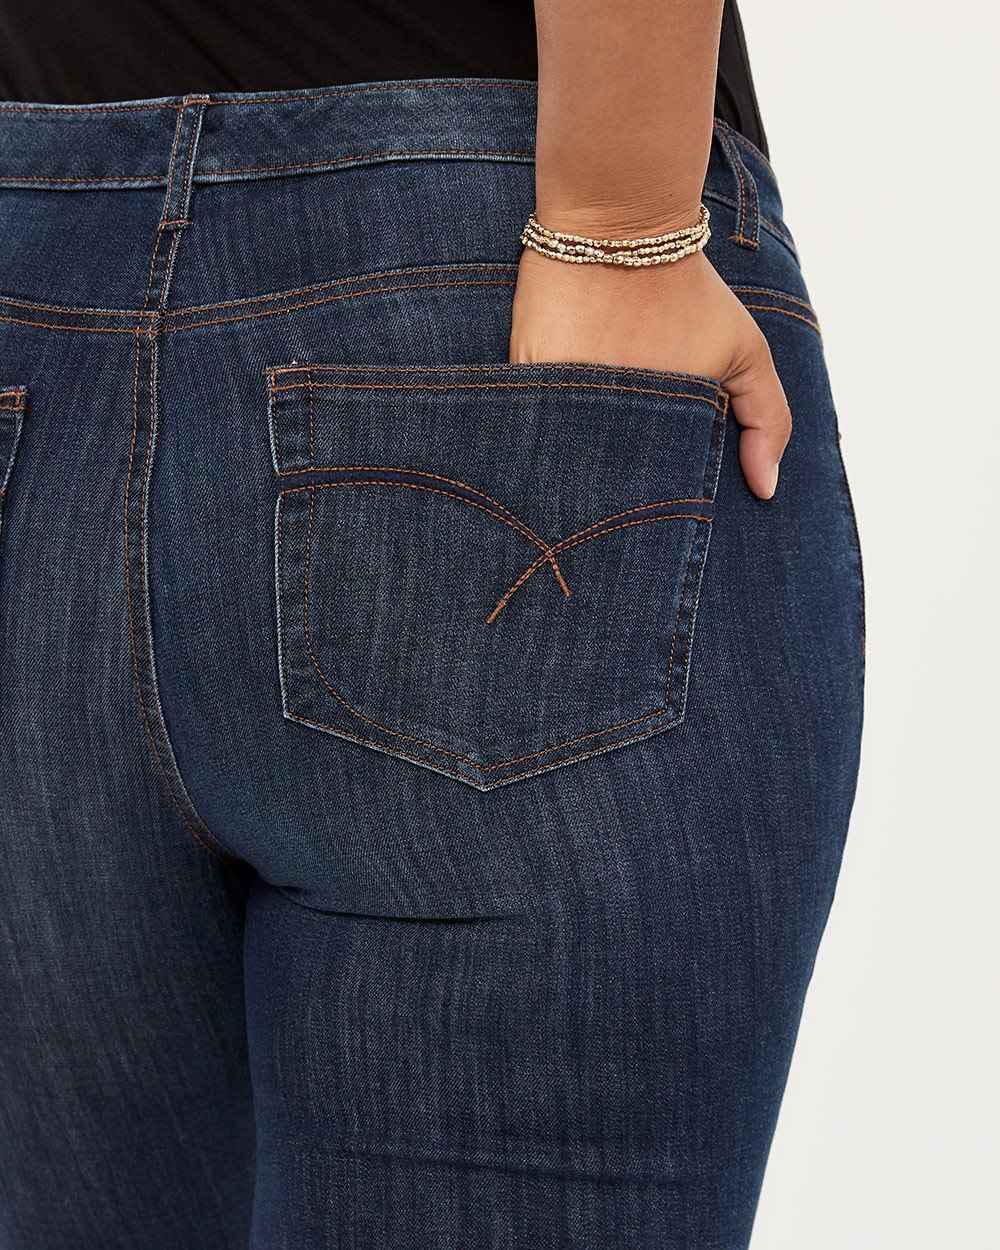 f8cee3a85ba911 Lyst - Addition Elle Petite Slightly Curvy Fit Straight Leg Jean ...